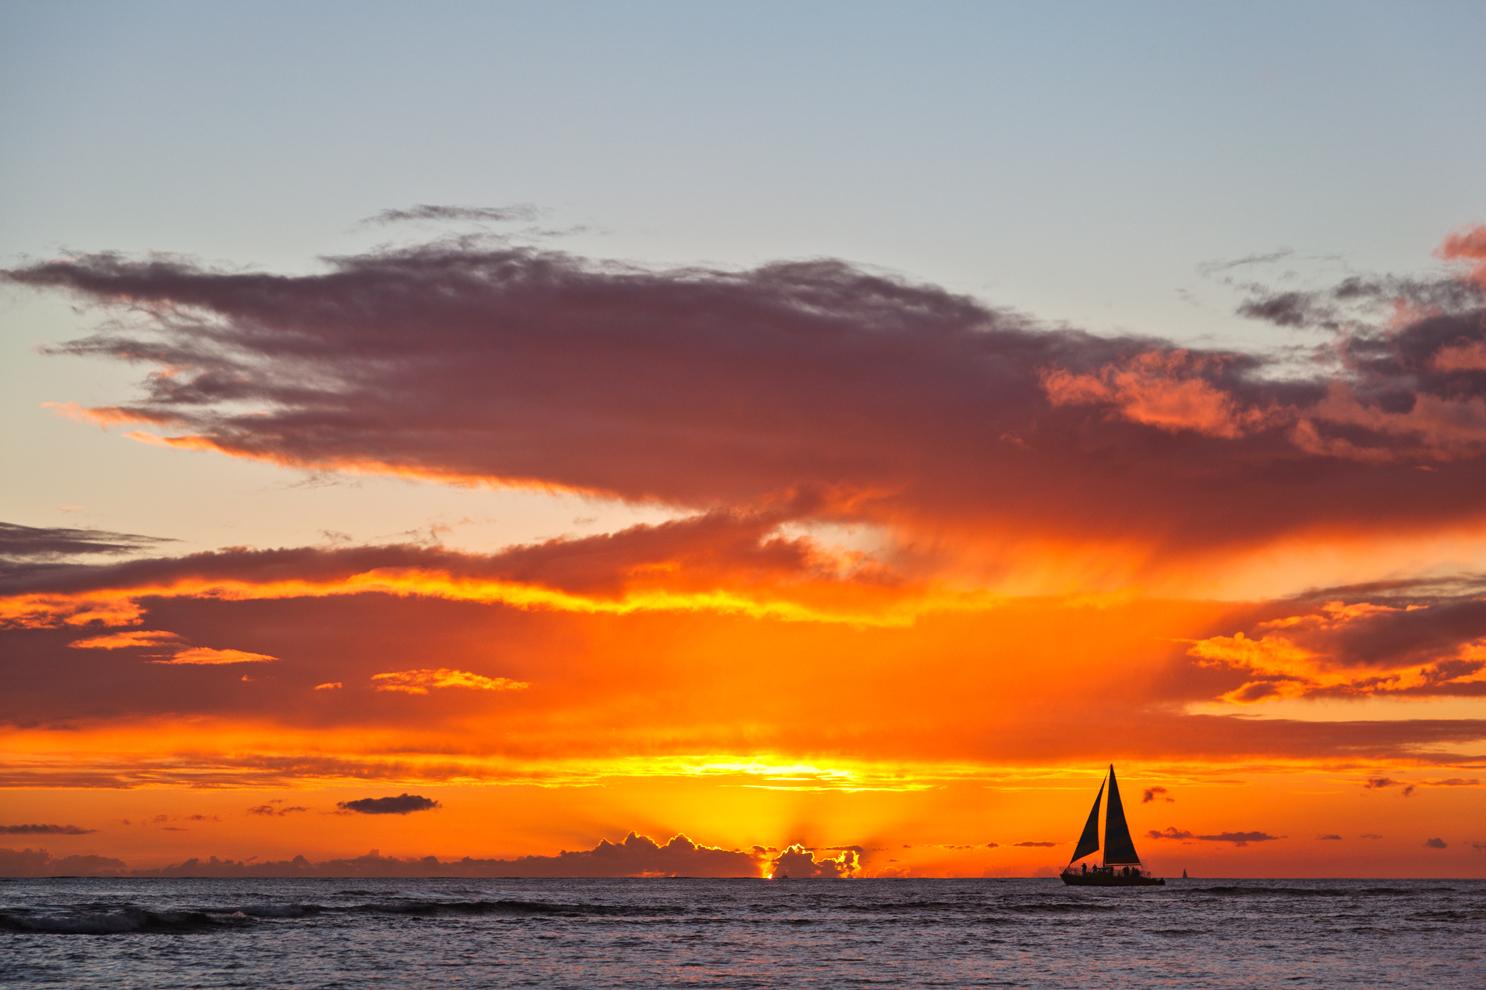 sailboat-on-the-horizon-at-sunset-travel-photographer.jpg